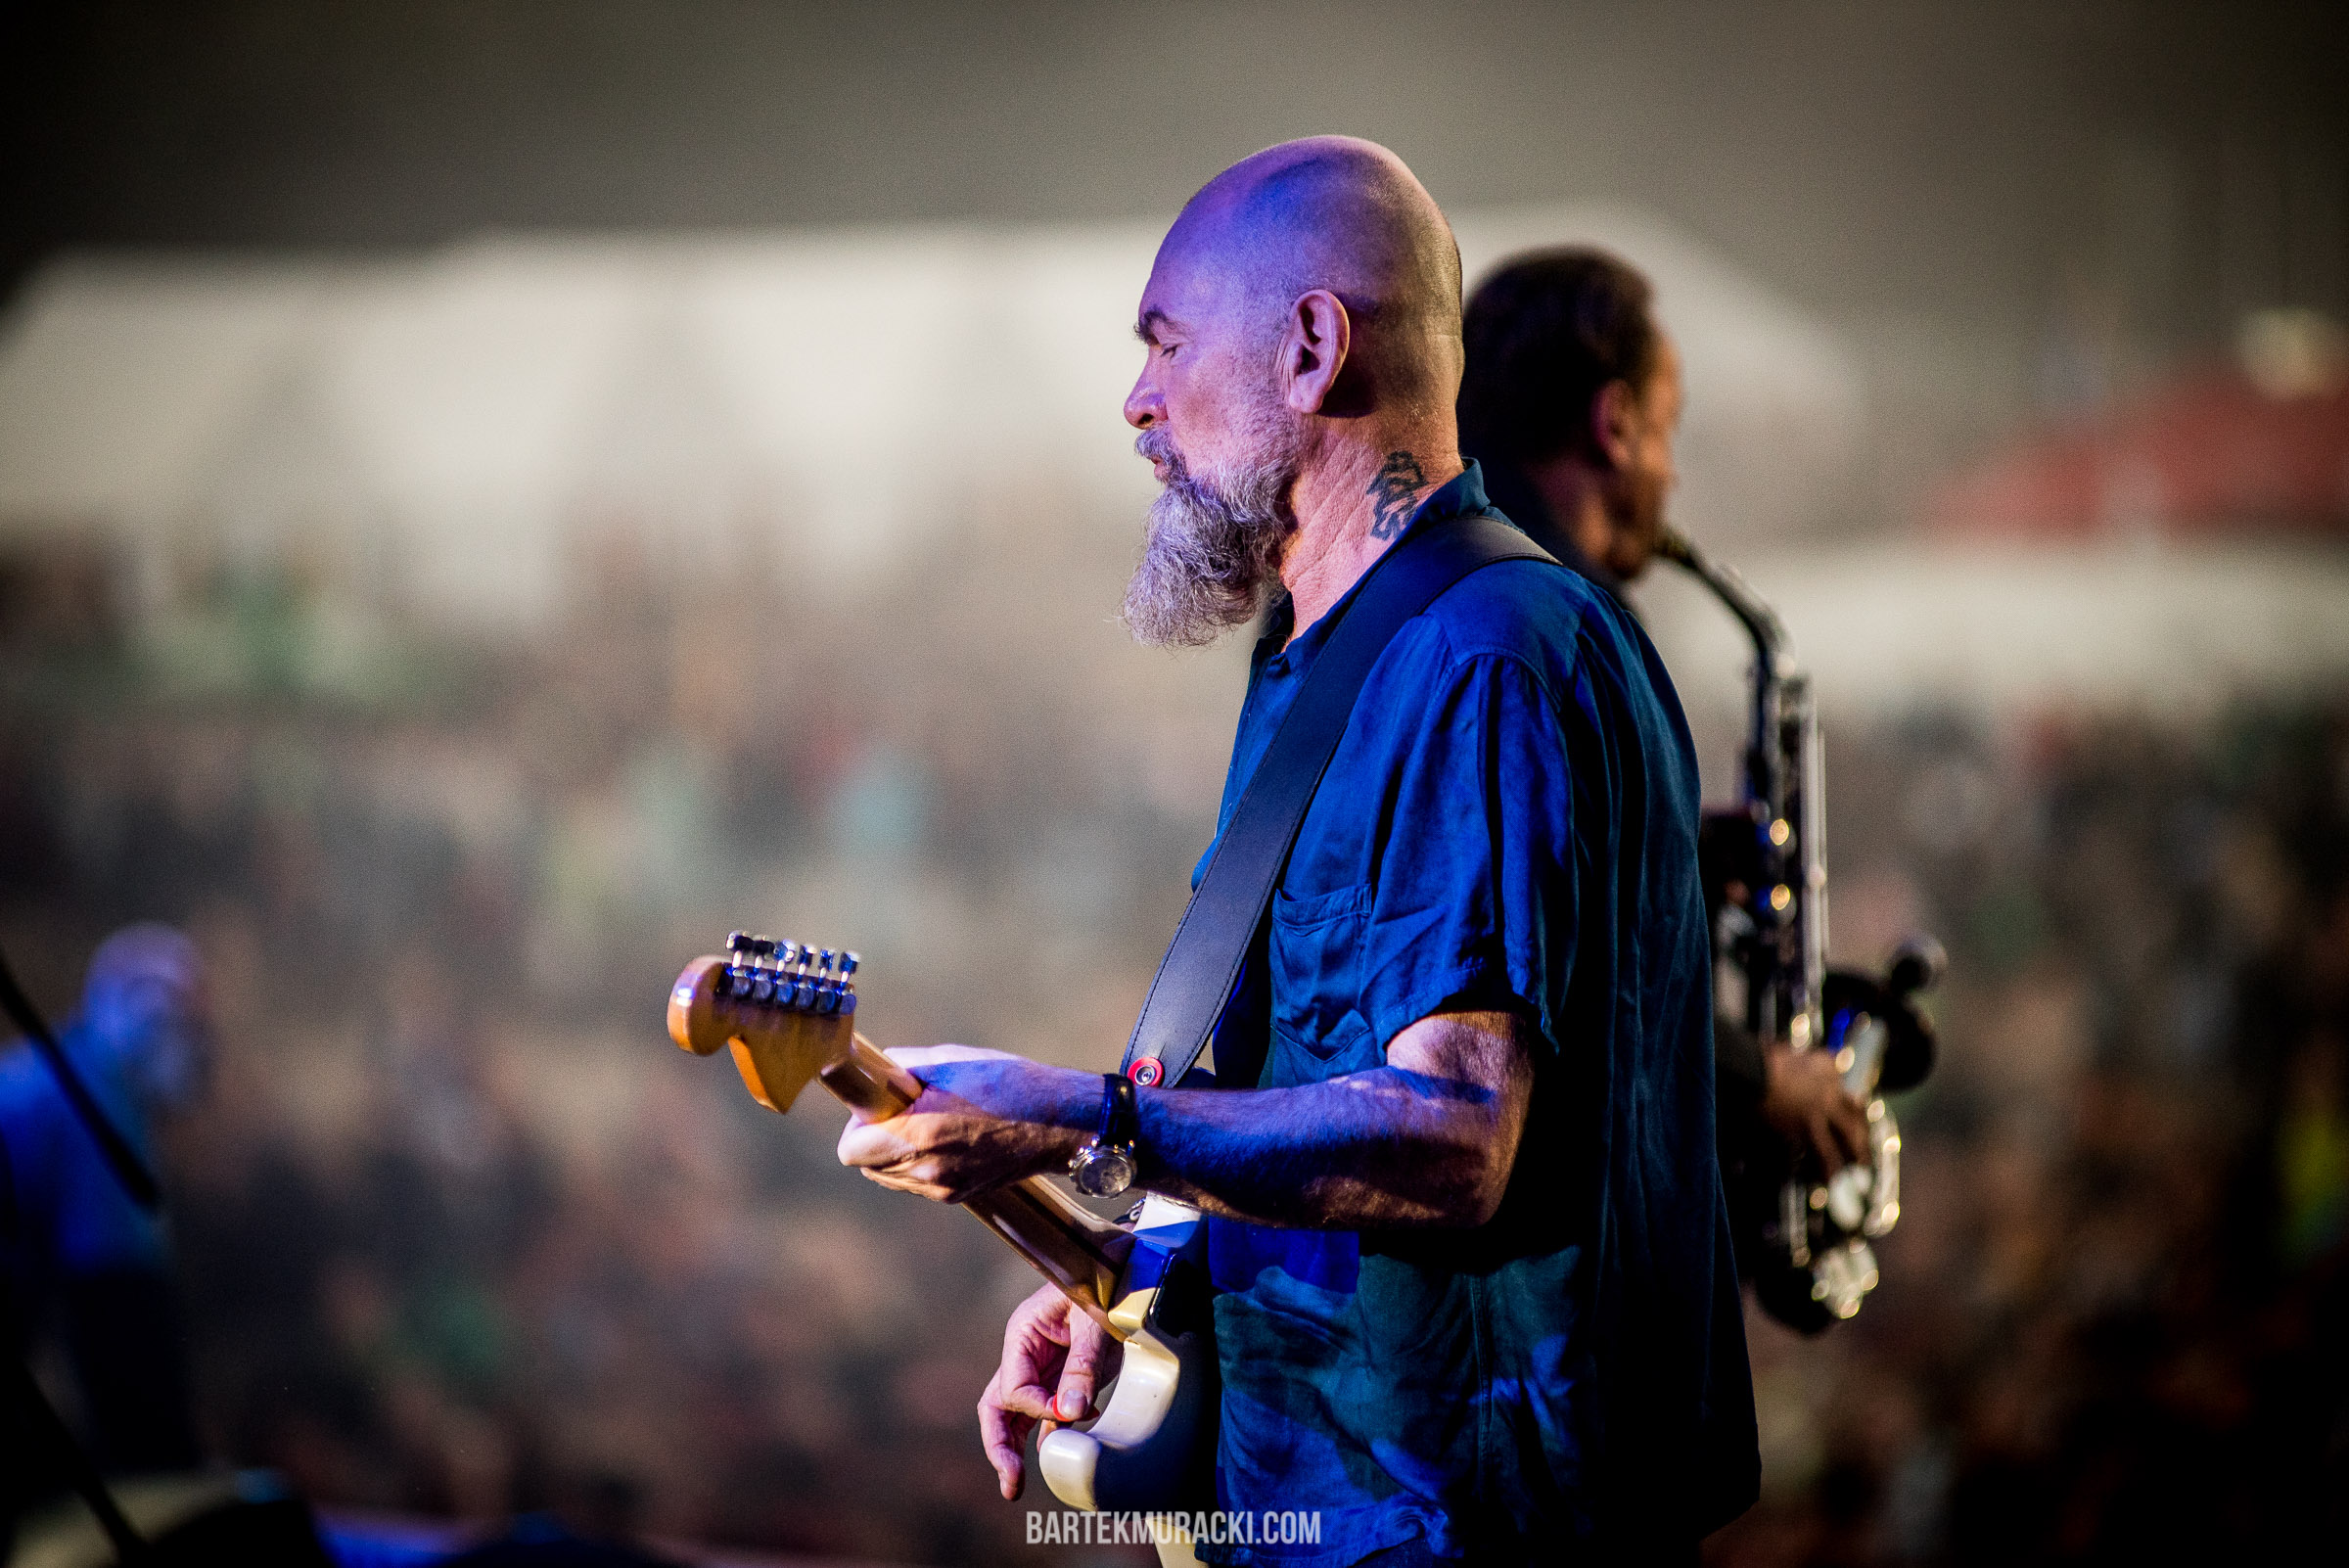 Koncerty-Przystanek-Woodstock-2015-photo-Bartek-Muracki-4116